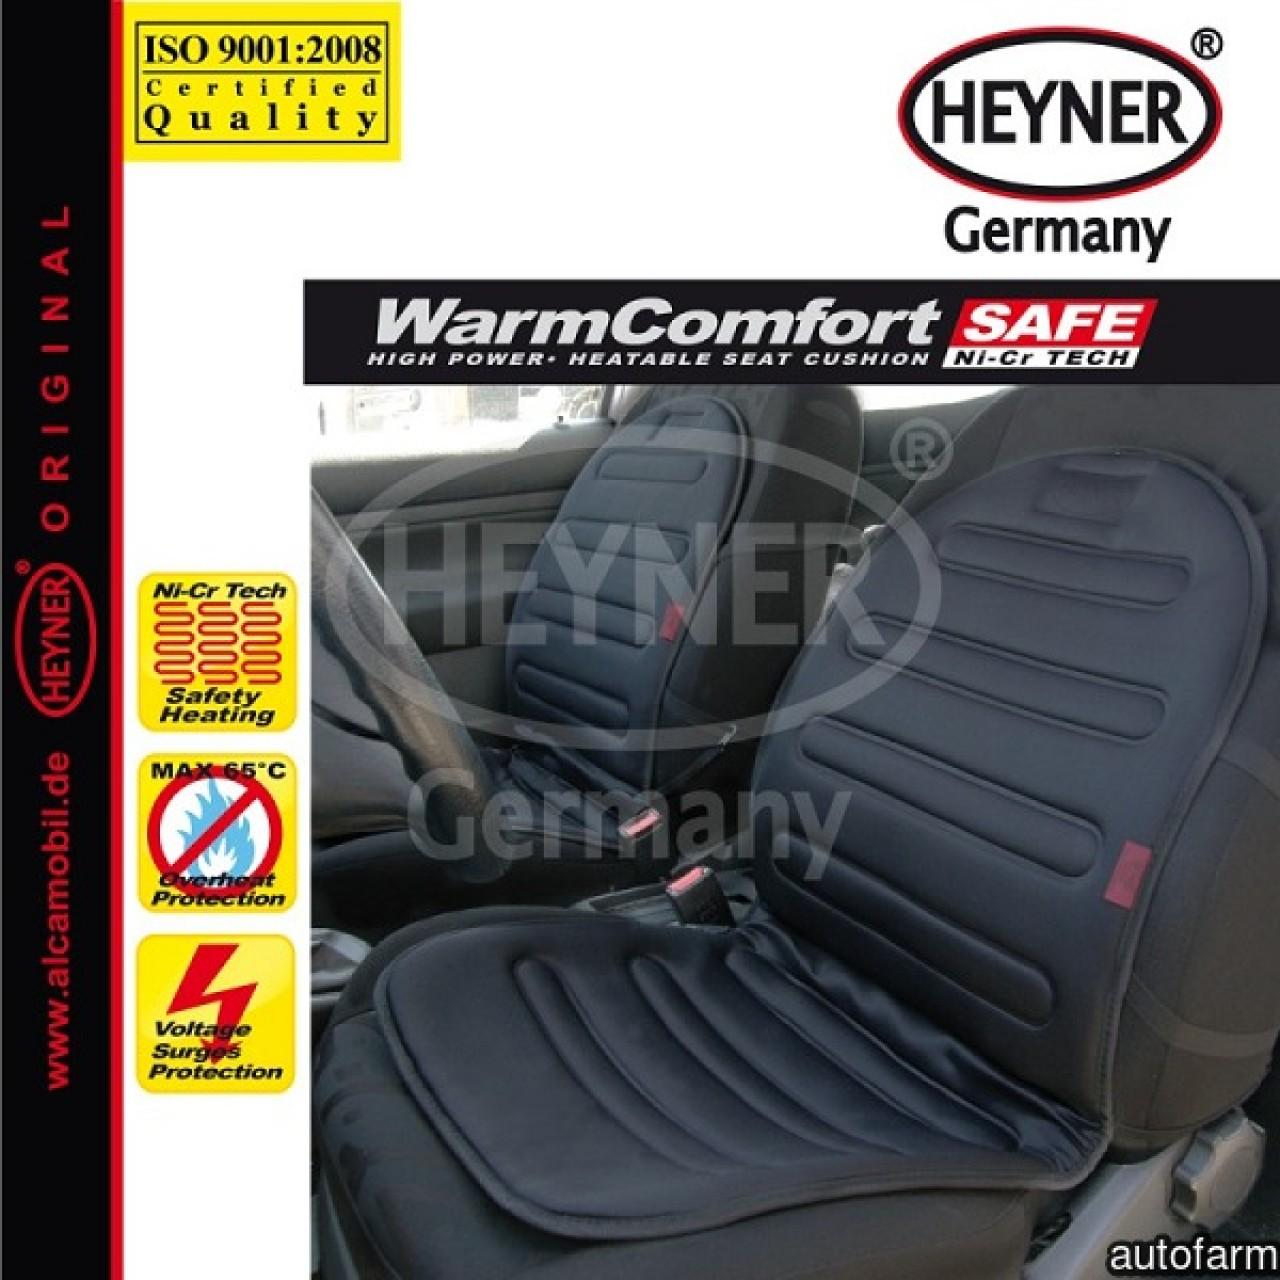 HUSA AUTO CU INCALZIRE 12V HEYNER 504 000 <br>